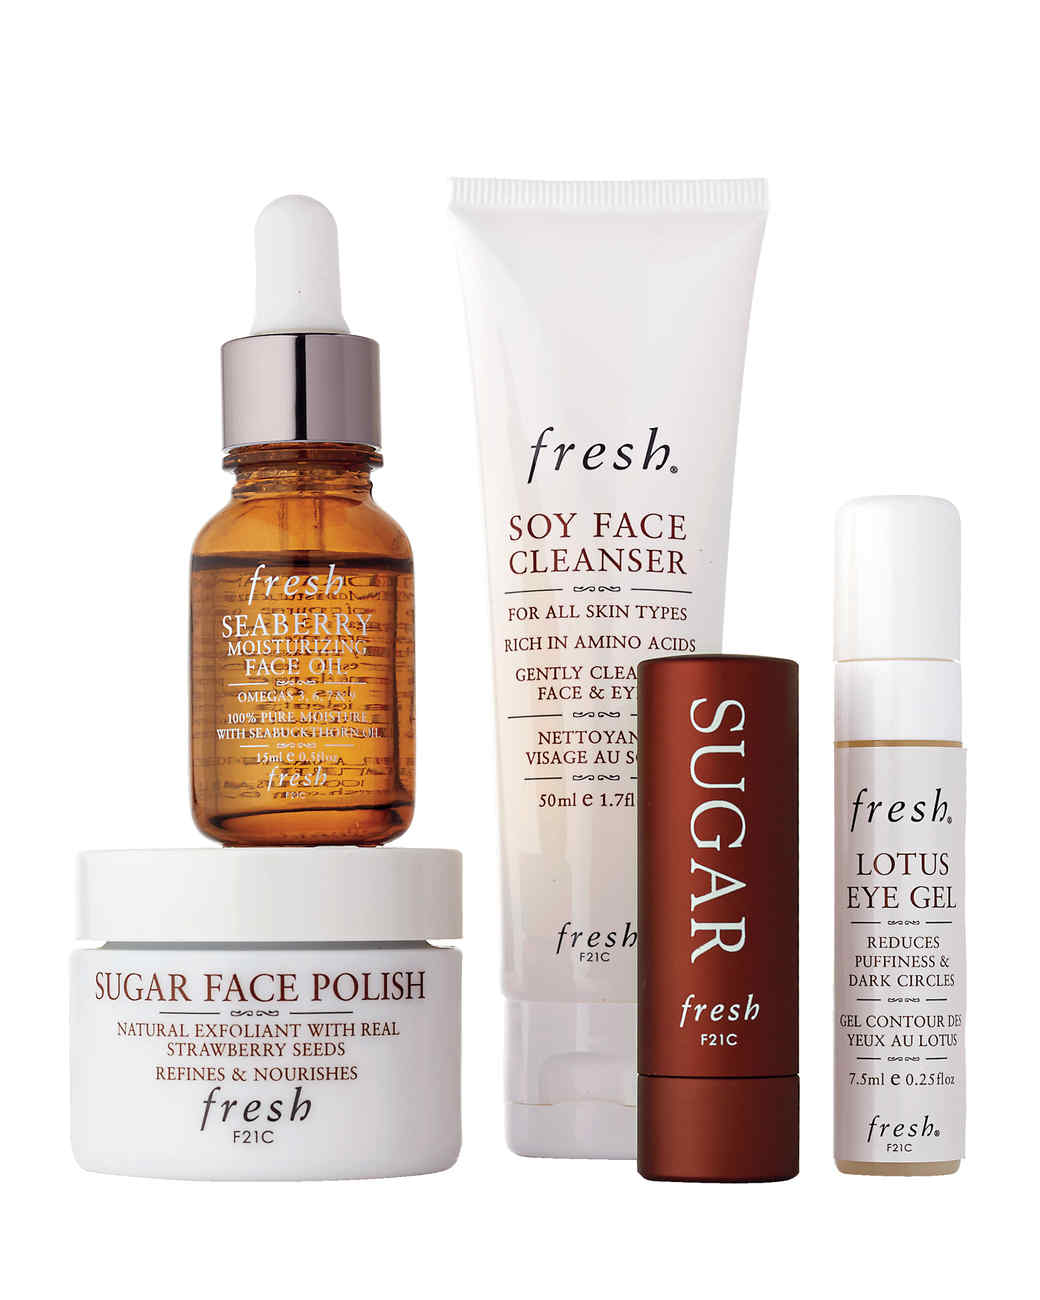 fresh-products-106-d111550.jpg